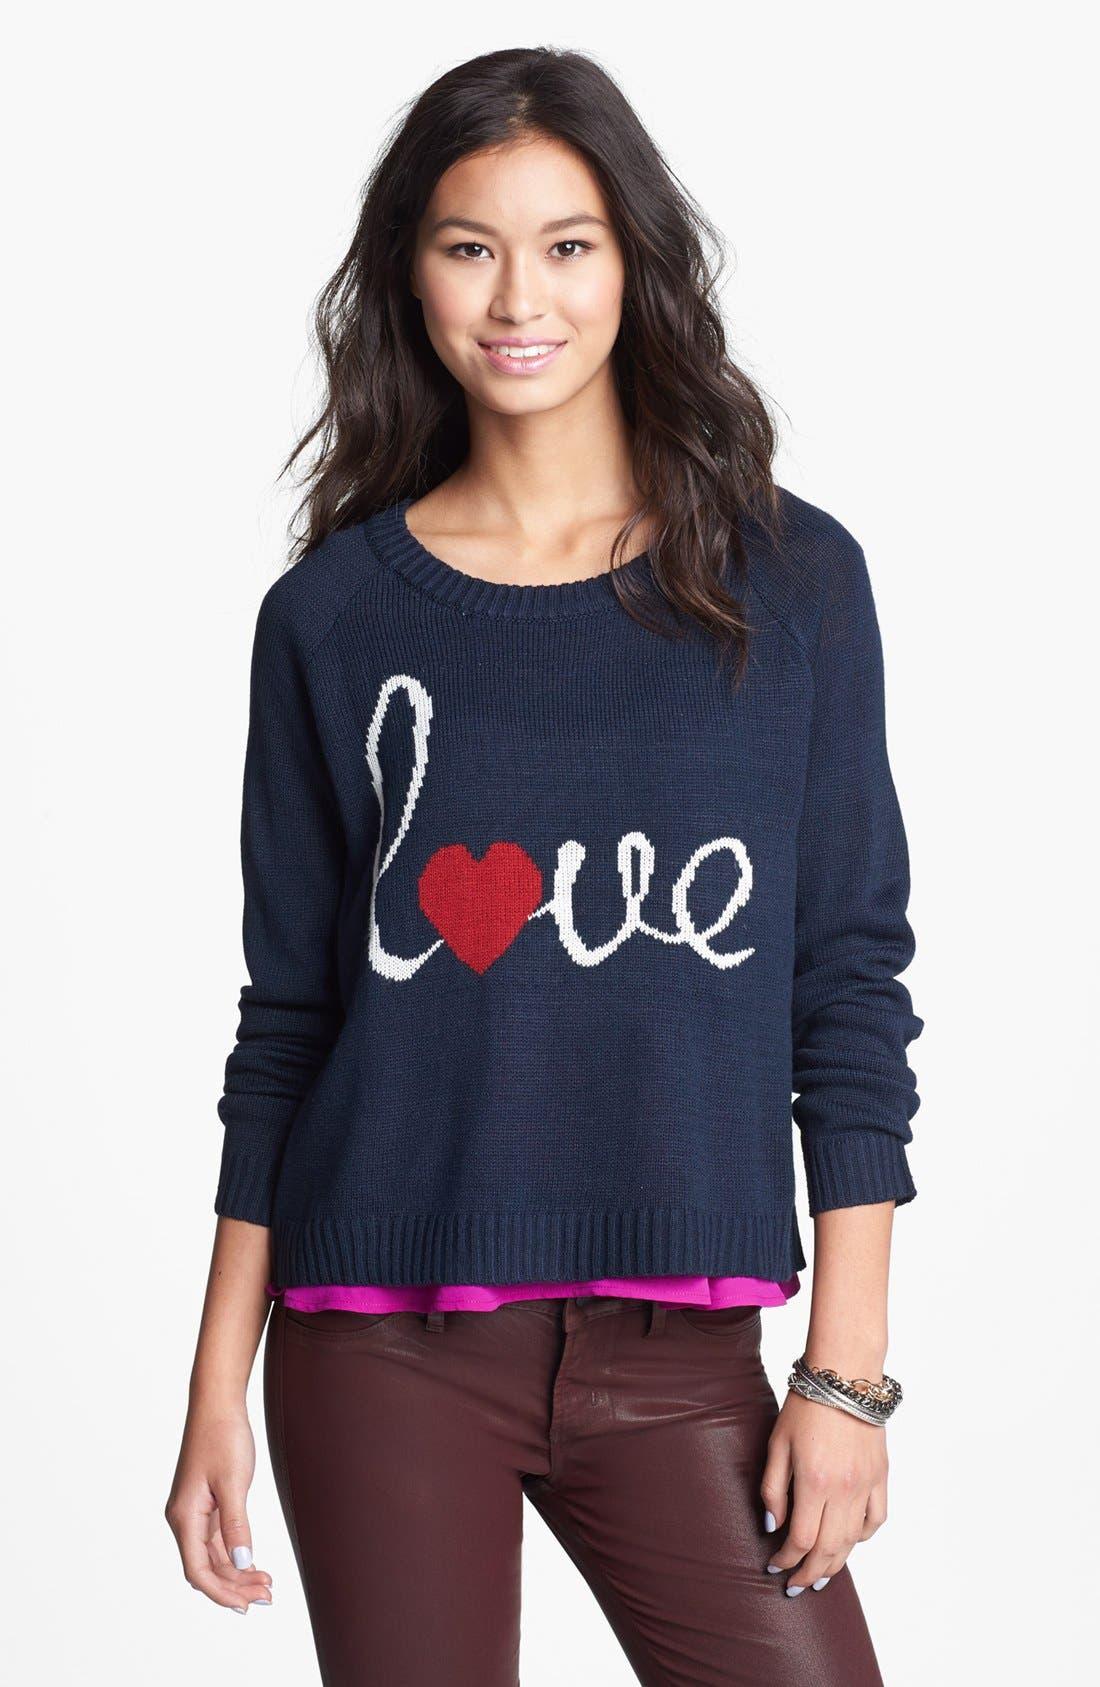 Alternate Image 1 Selected - Love by Design 'Love' Scoop Neck Sweater (Juniors)